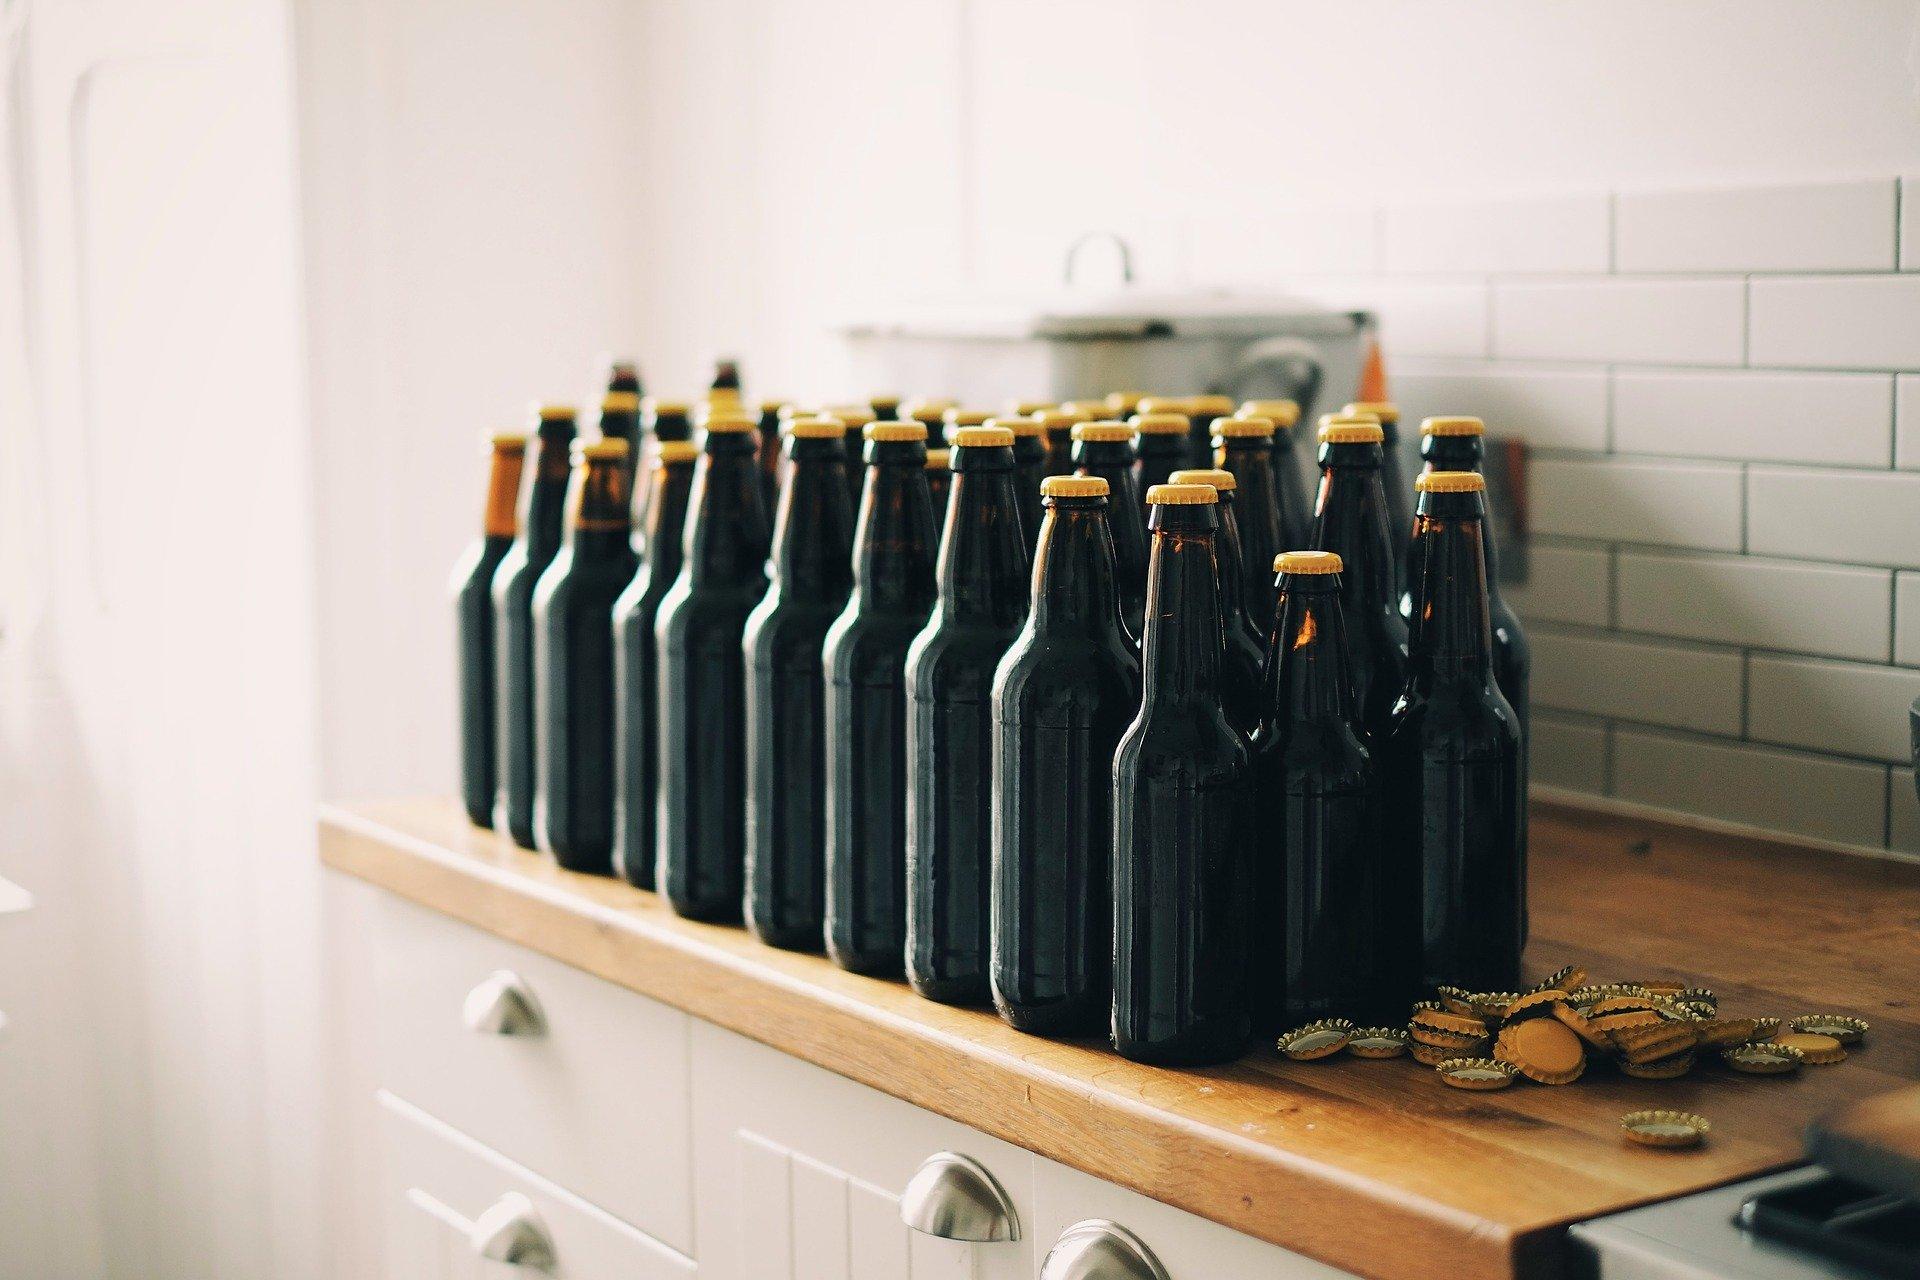 bottle-caps-1866945_1920